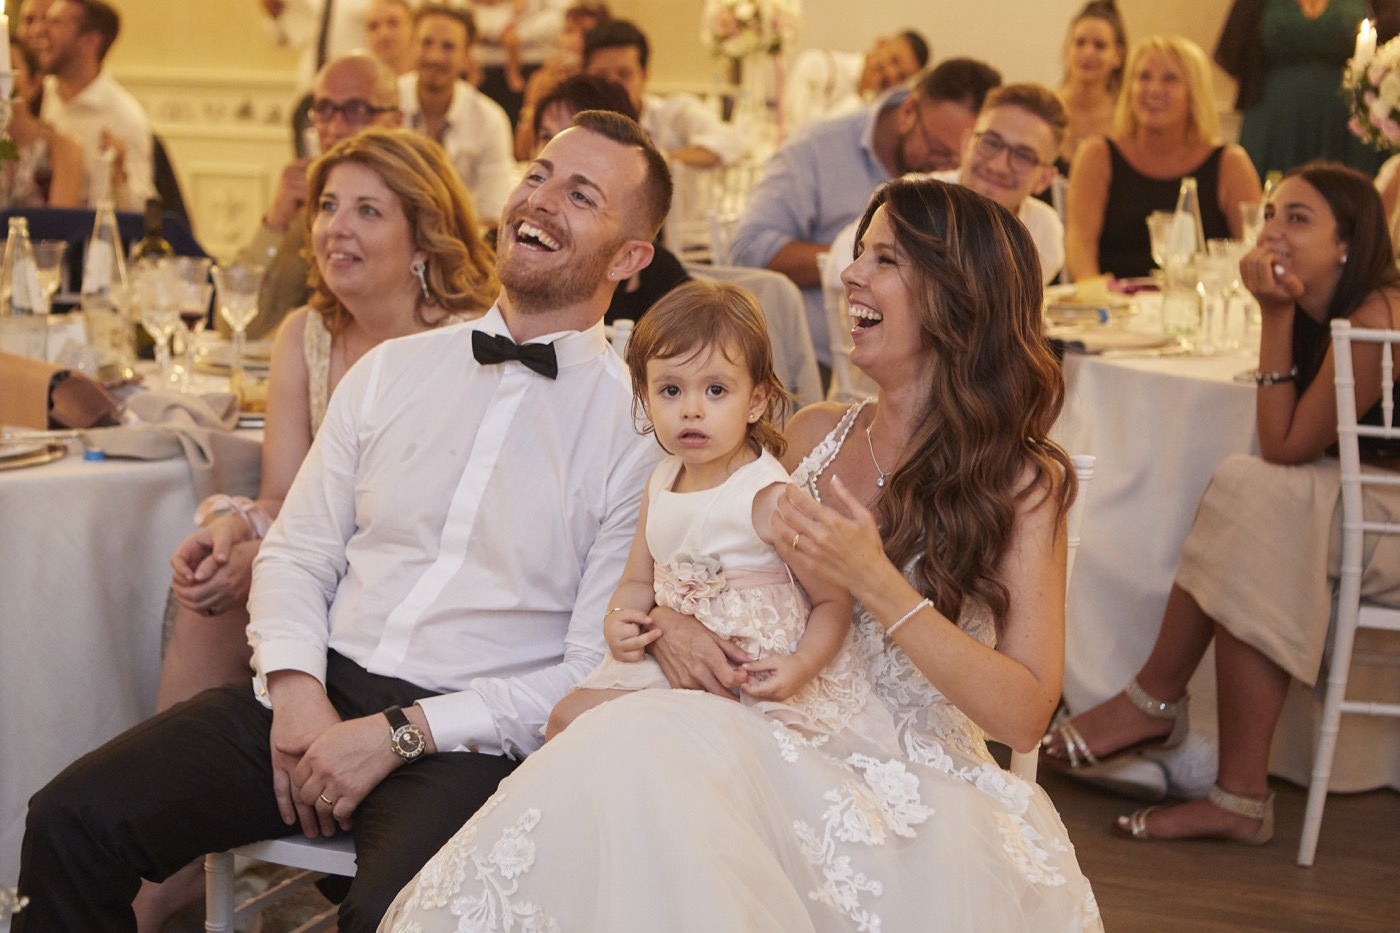 Claudio-Coppola-wedding-photographer-la-scuderia-eventi-preparativi-la-rosetta-perugia-88